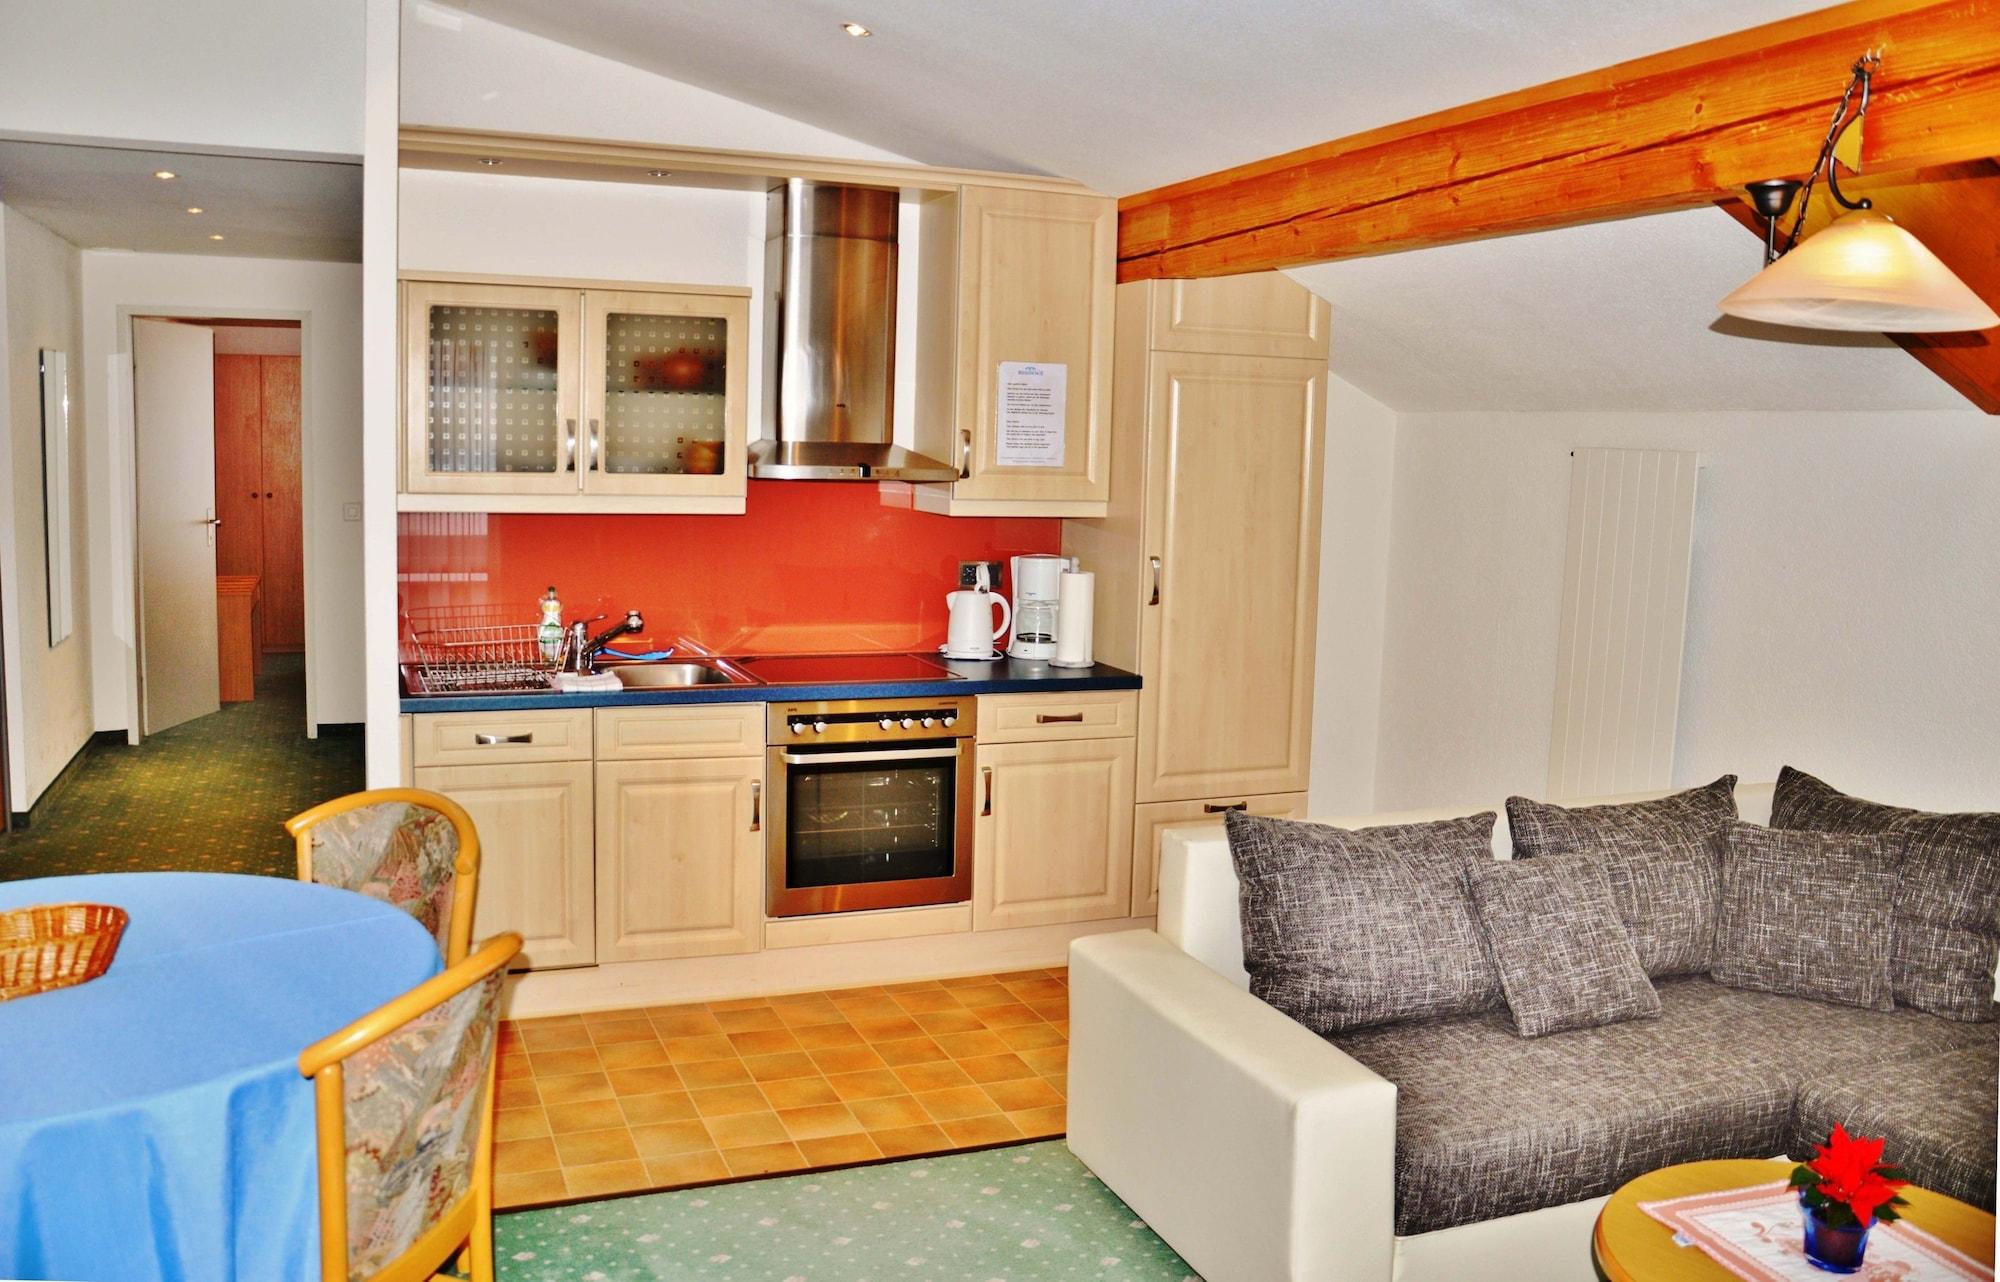 Residence Hotel & Apartments, Interlaken